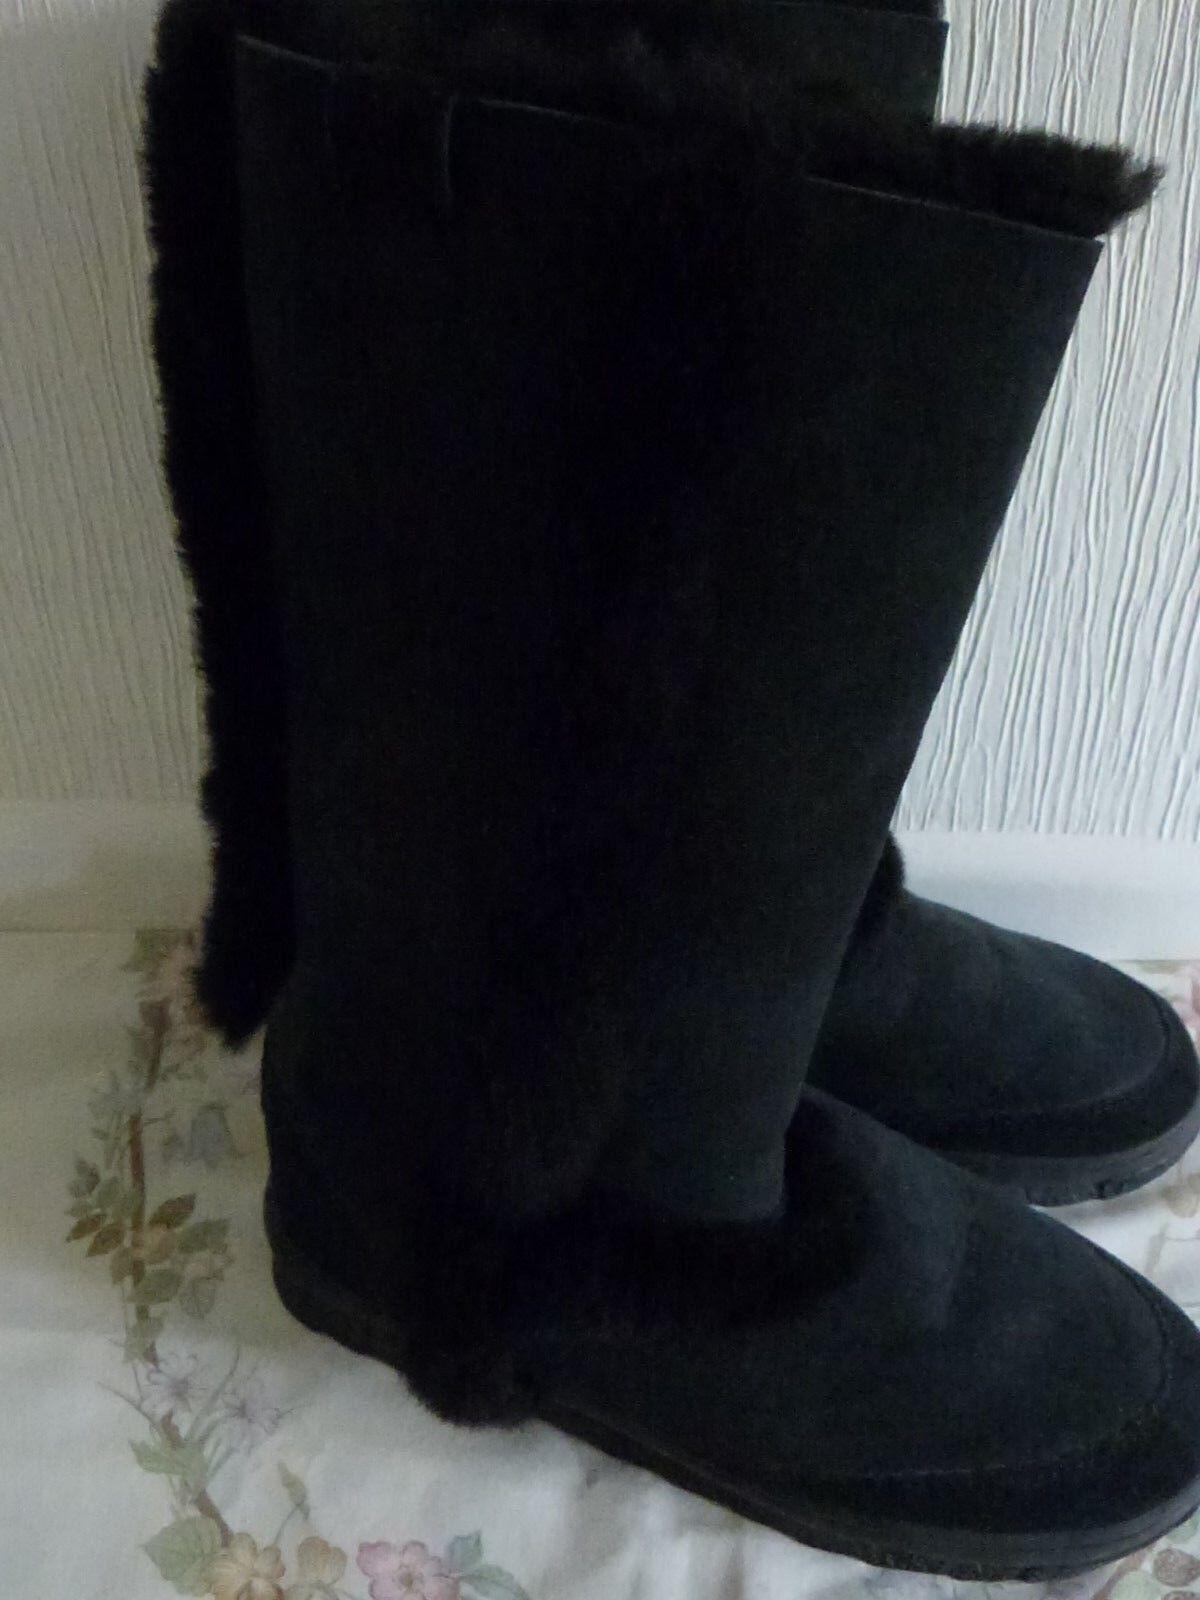 EMU ECHDNA BOOTS SIZE 5 UK BLACK